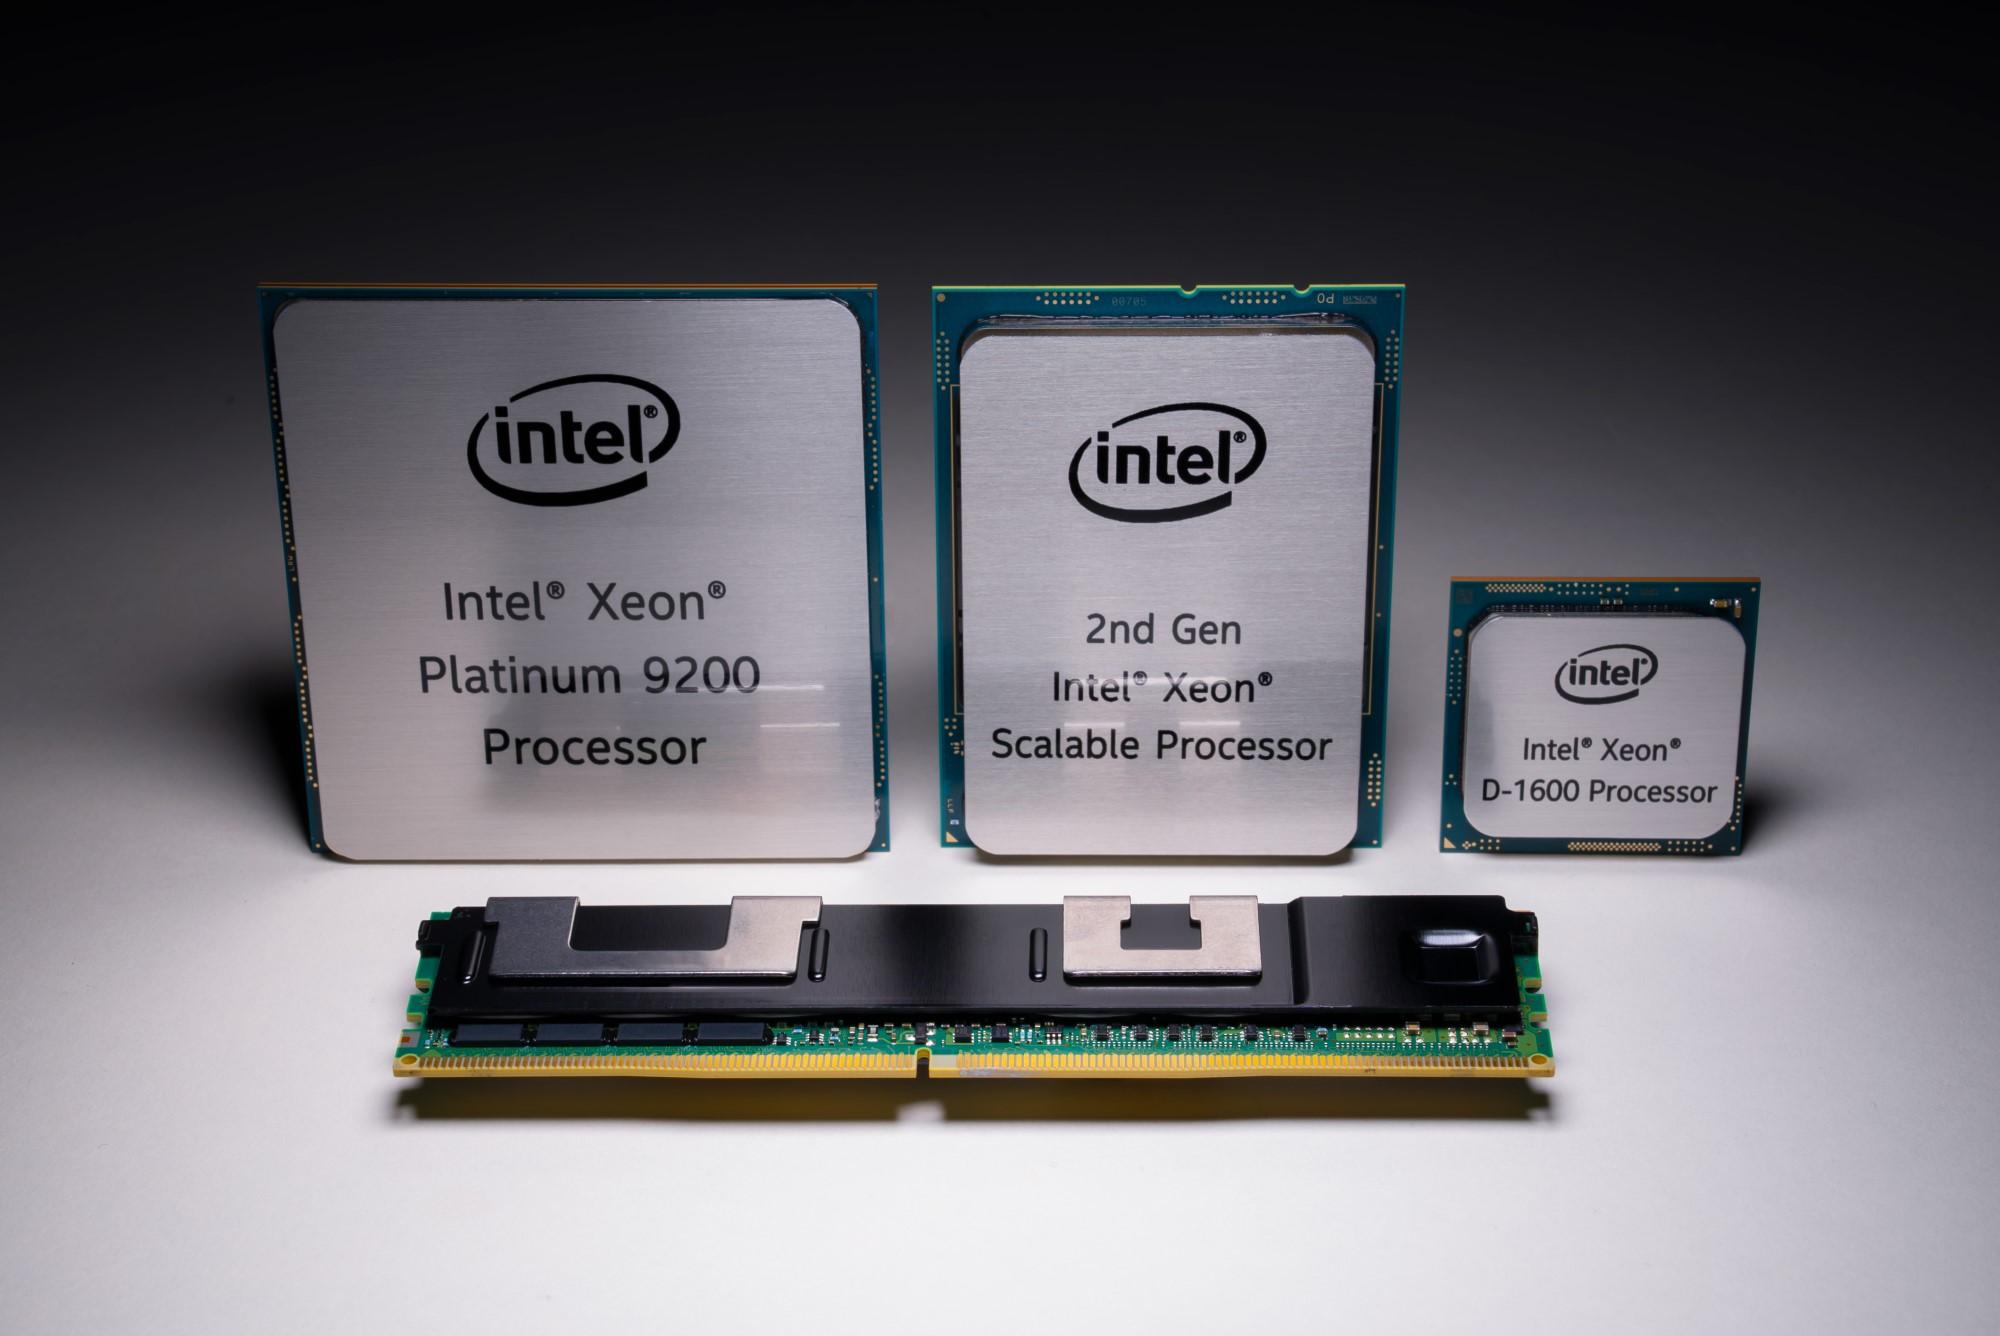 Intel data center chips